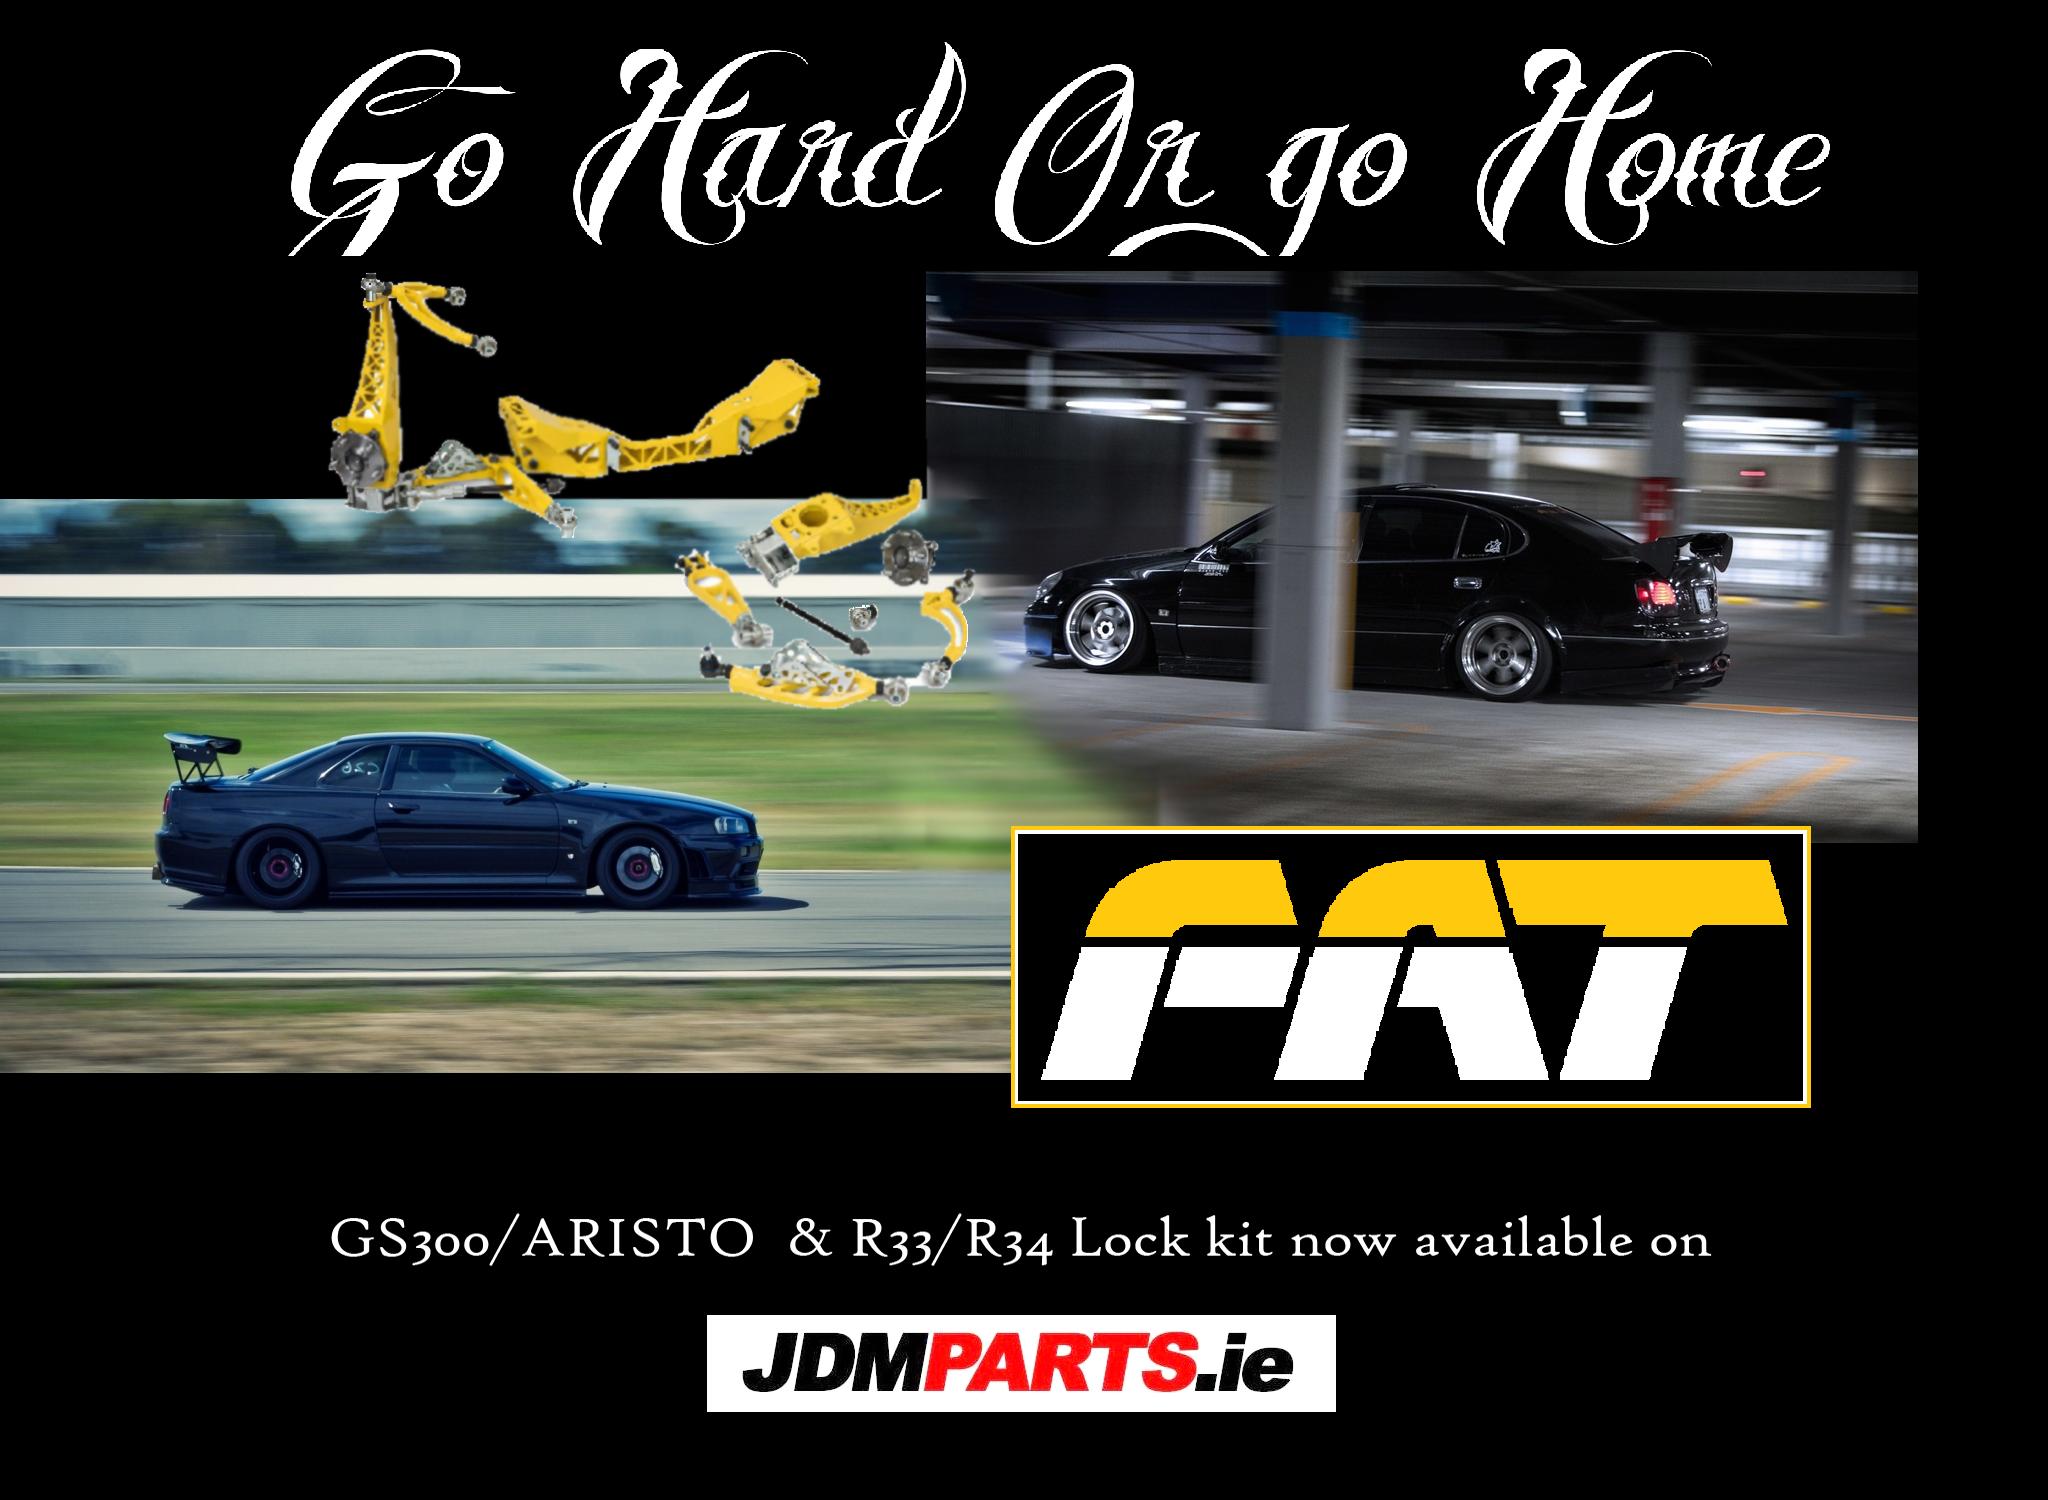 http://jdmparts.ie/148--drift-kit